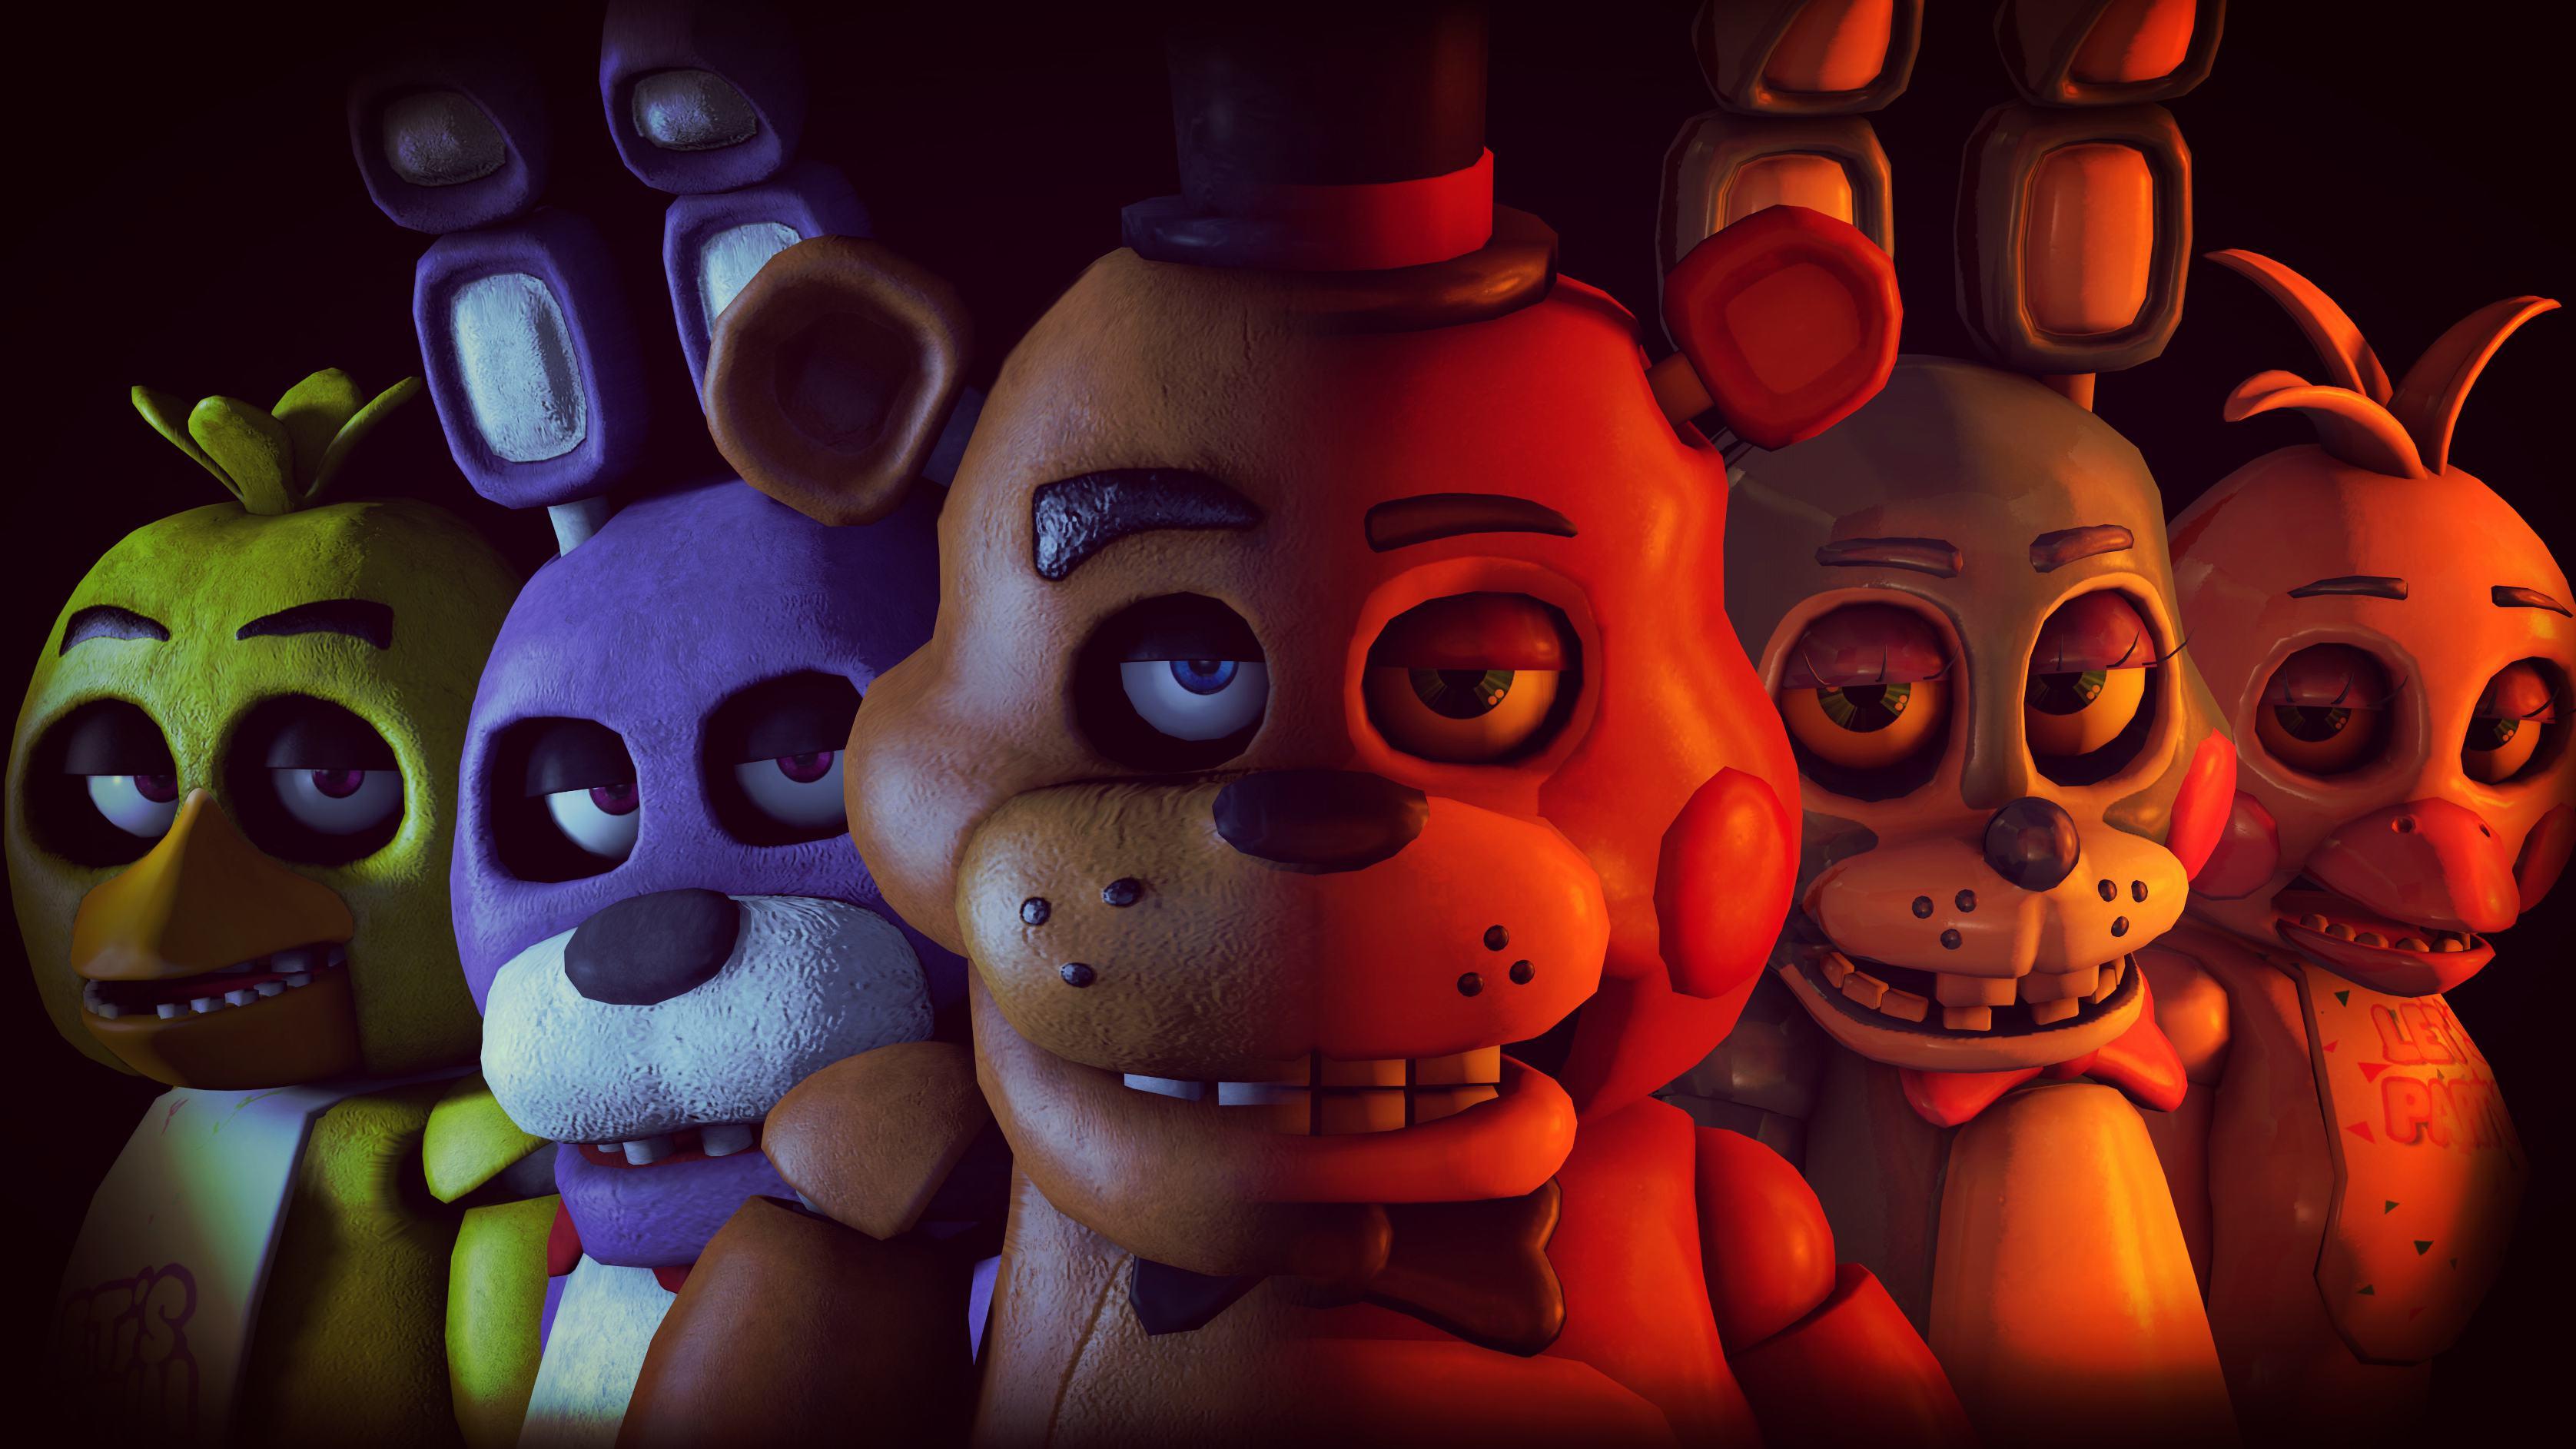 How to Play Freddy Fazbear's Pizzeria Simulator (FNAF6) With